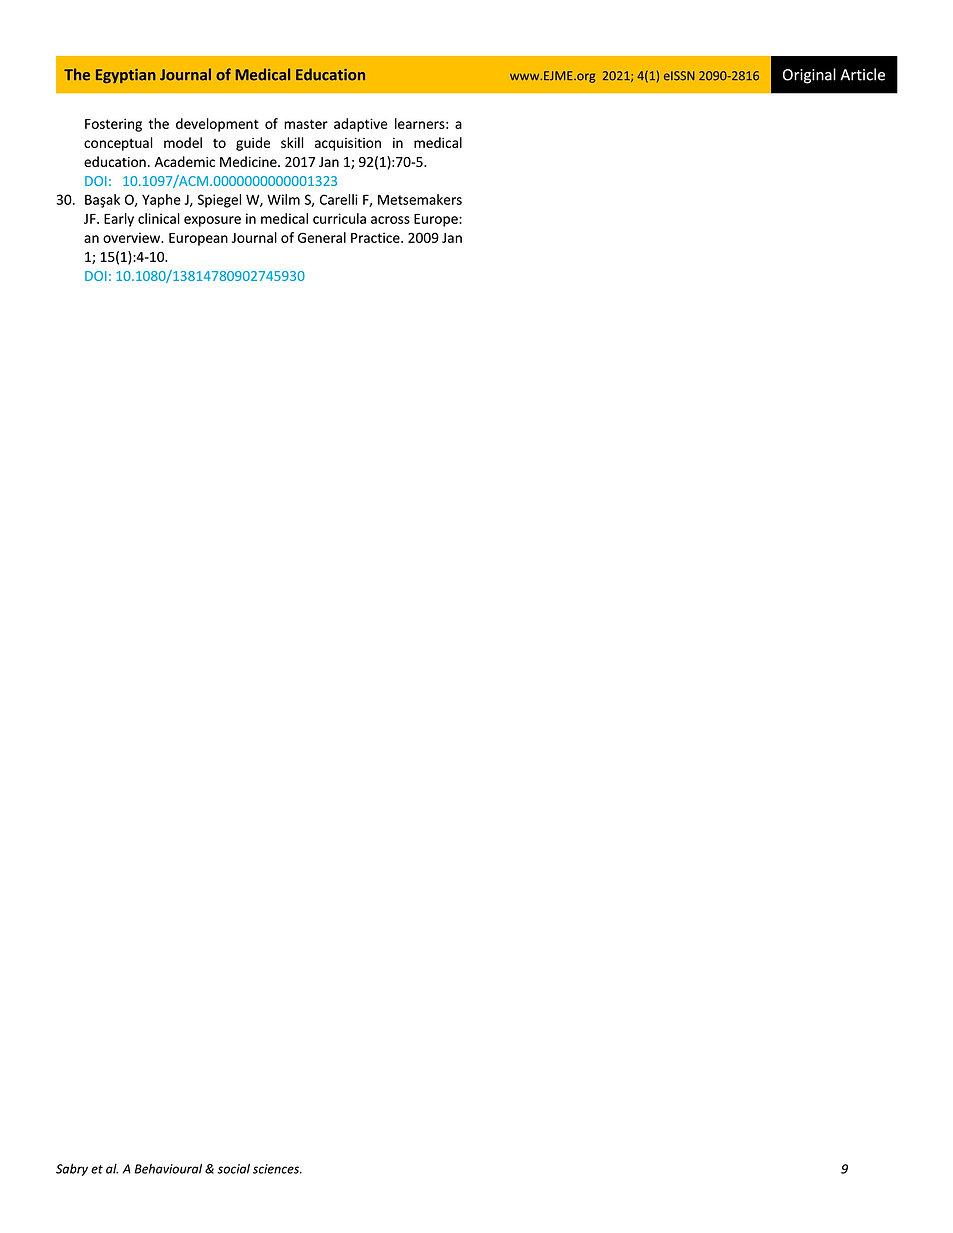 B&SS paper EJME template_9.jpg